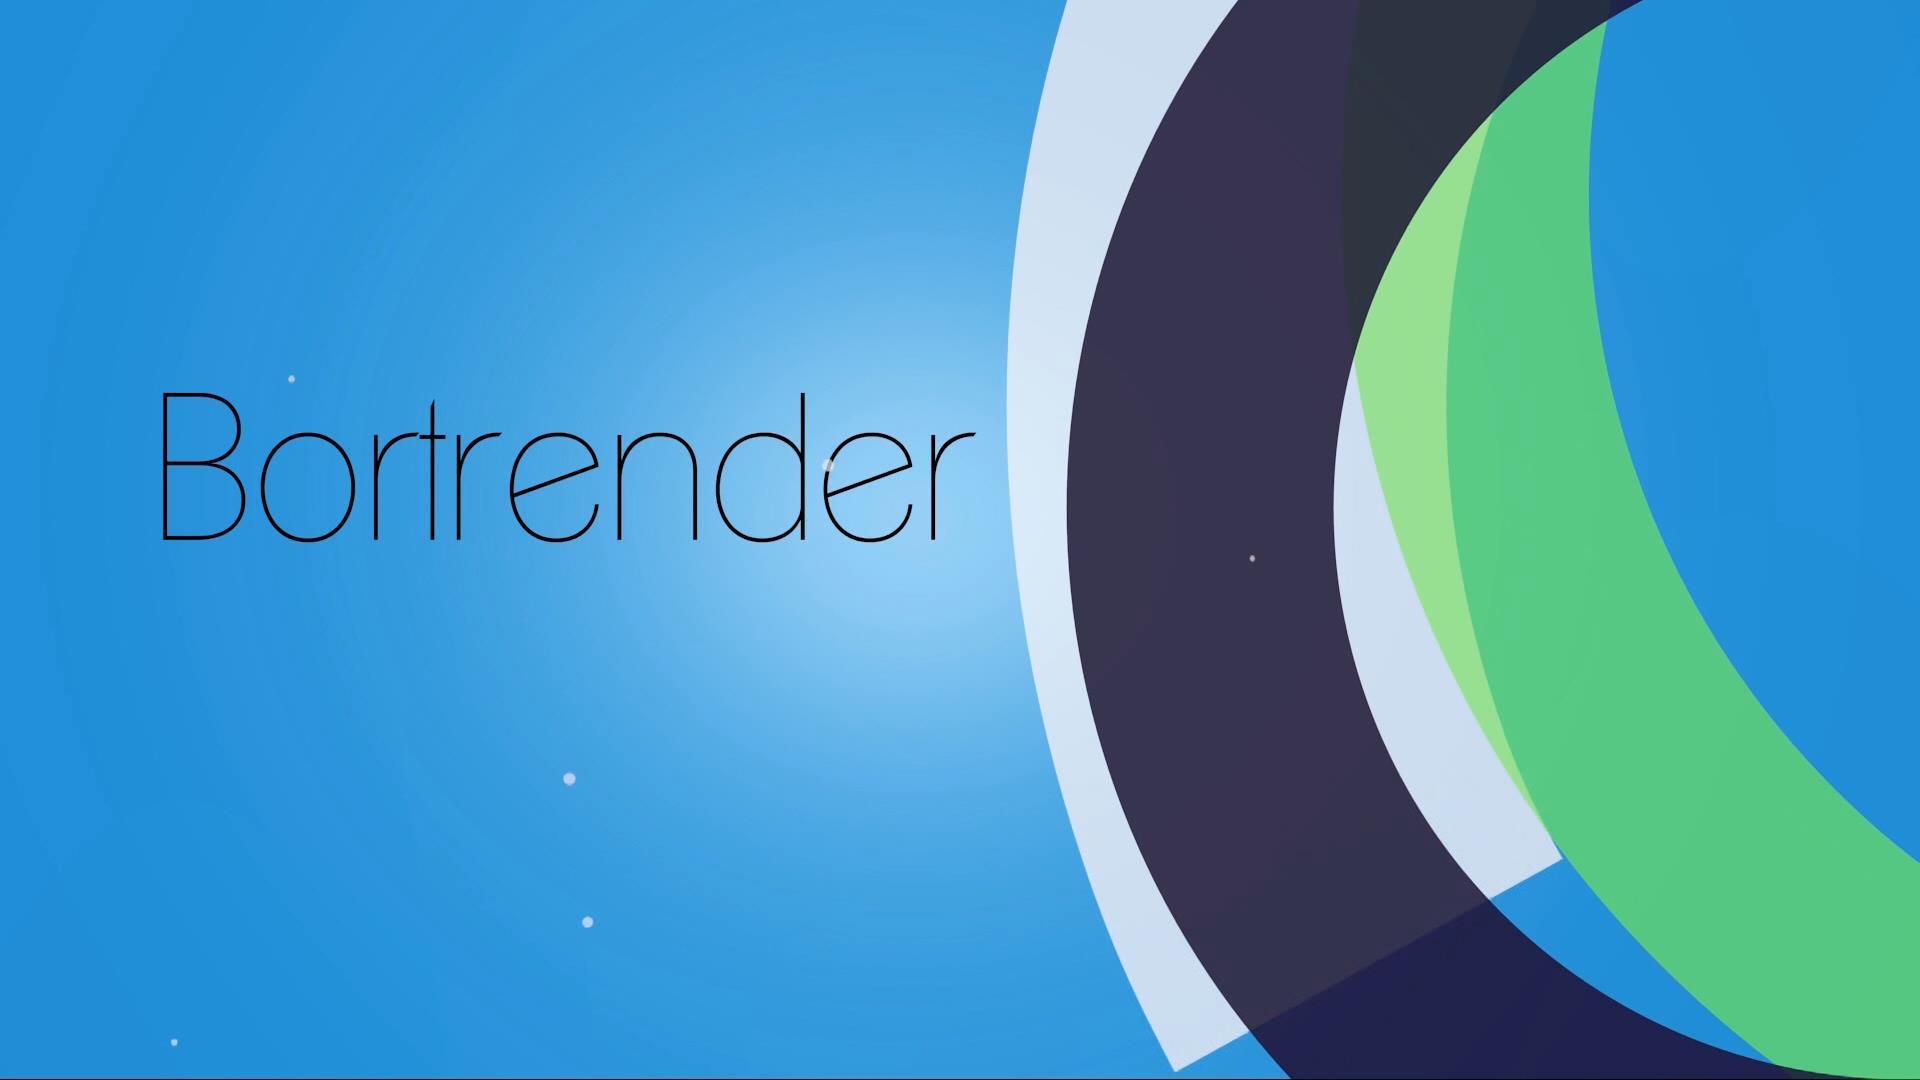 Bortrender – 2016.11.22.